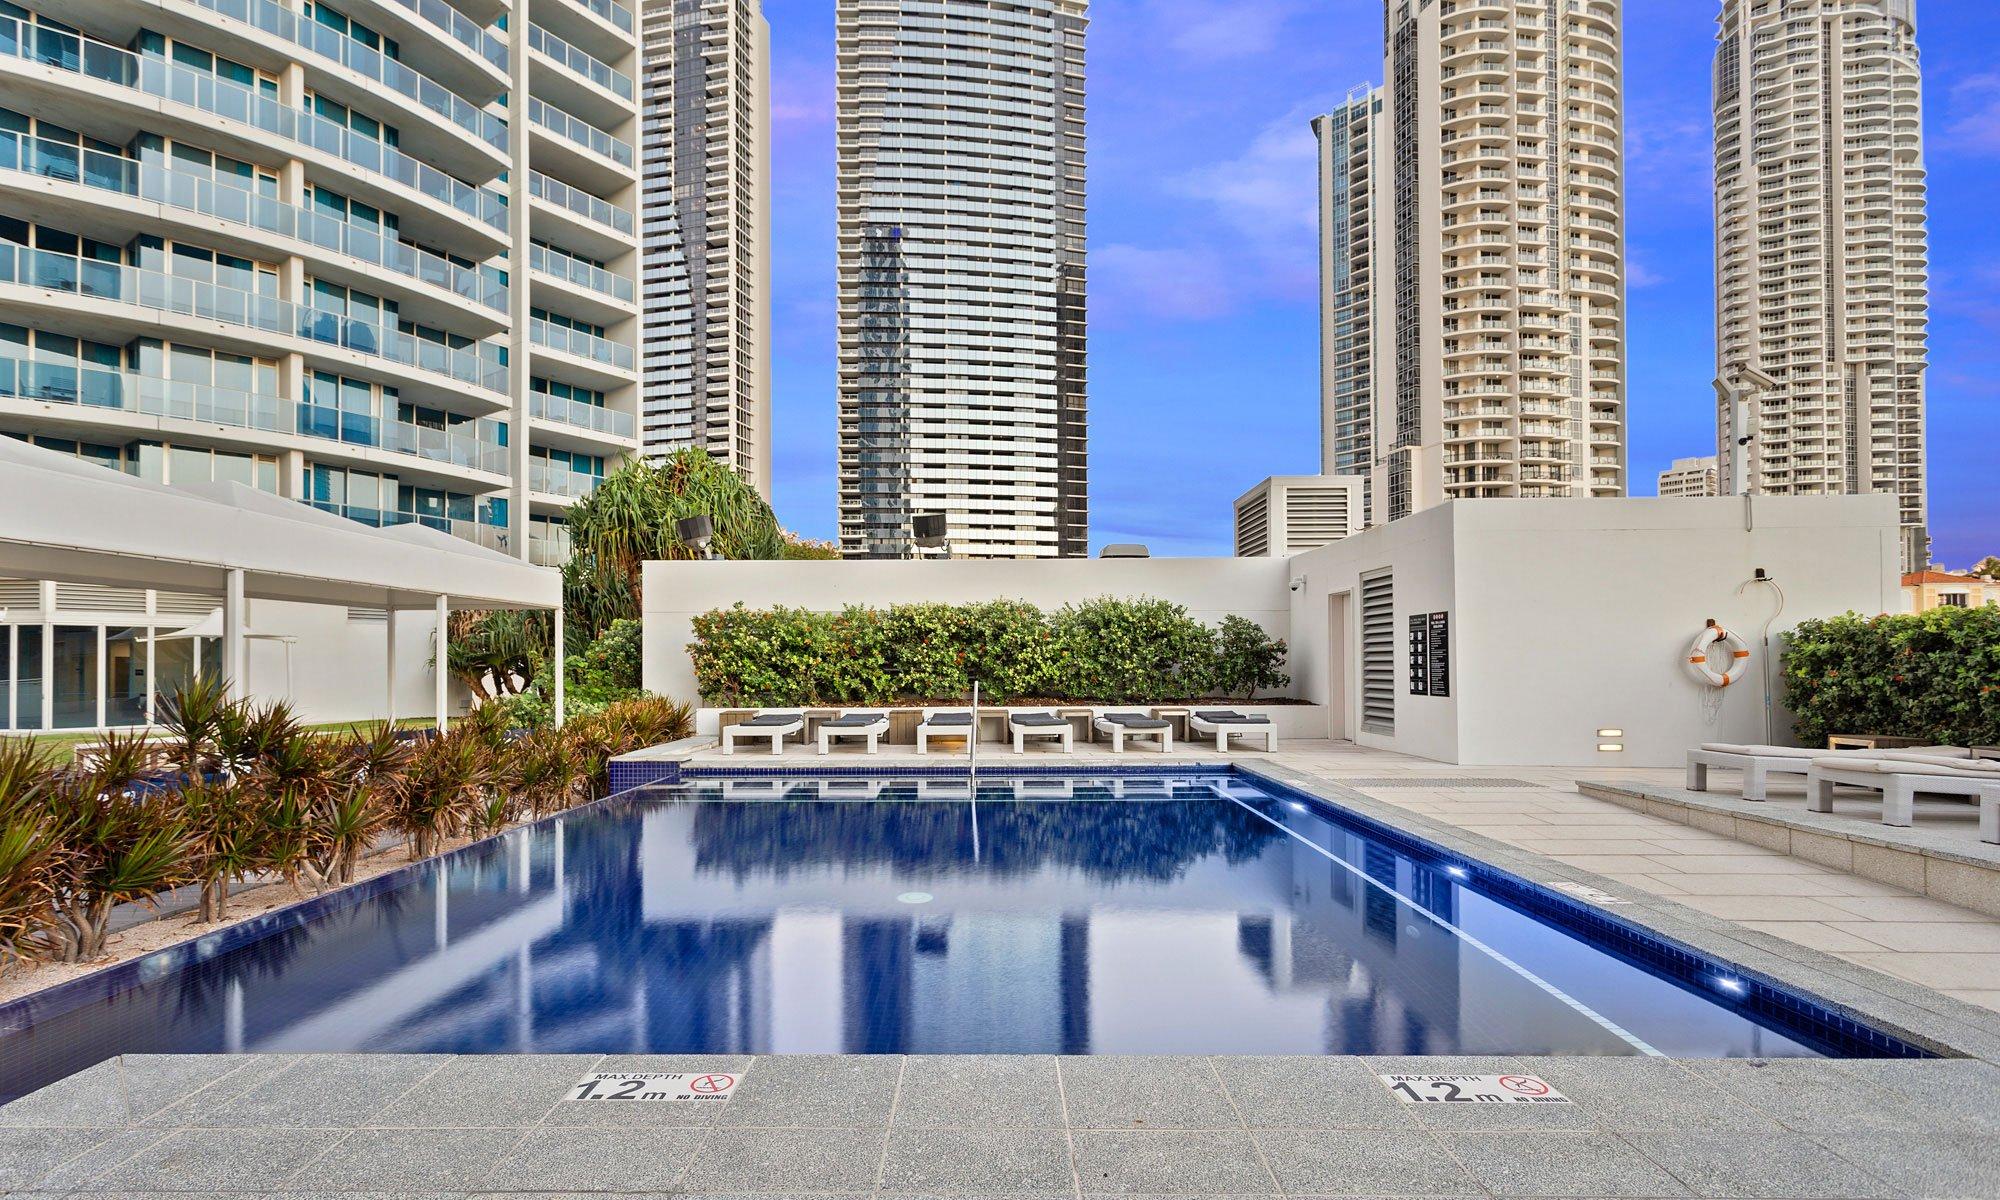 H Residences above Hilton Surfers Paradise facilities plunge pool